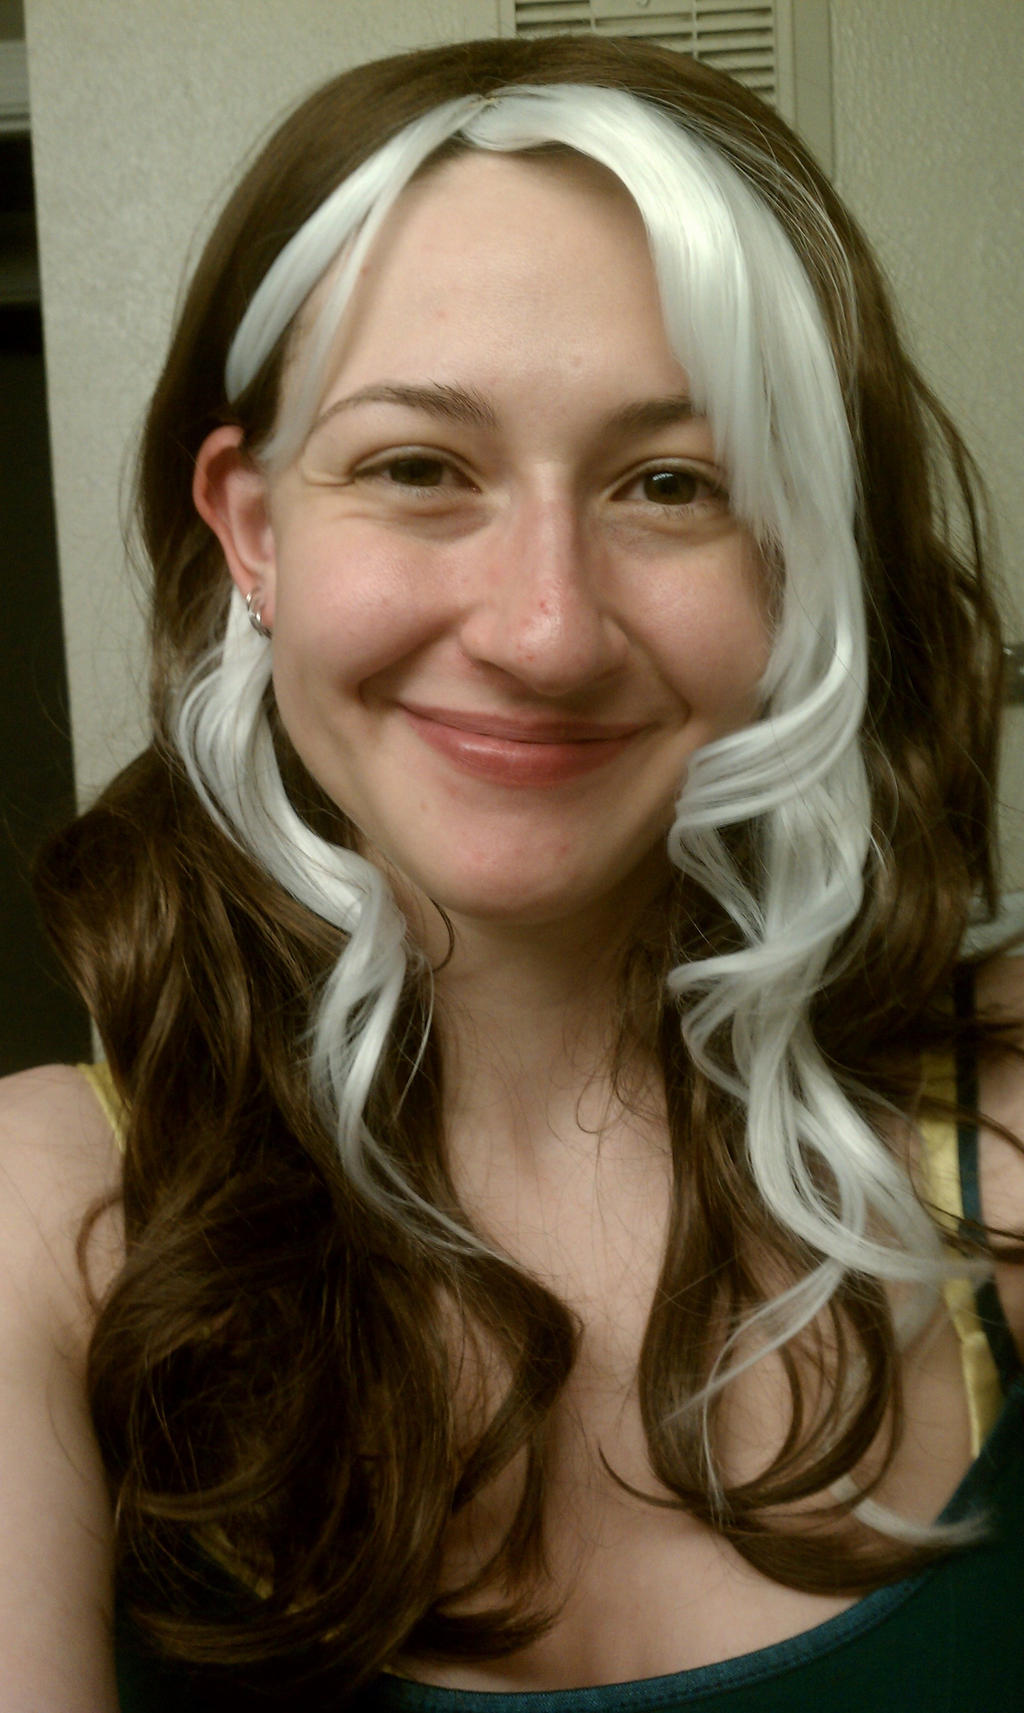 Rogue Hair - Viewing G... Anna Paquin